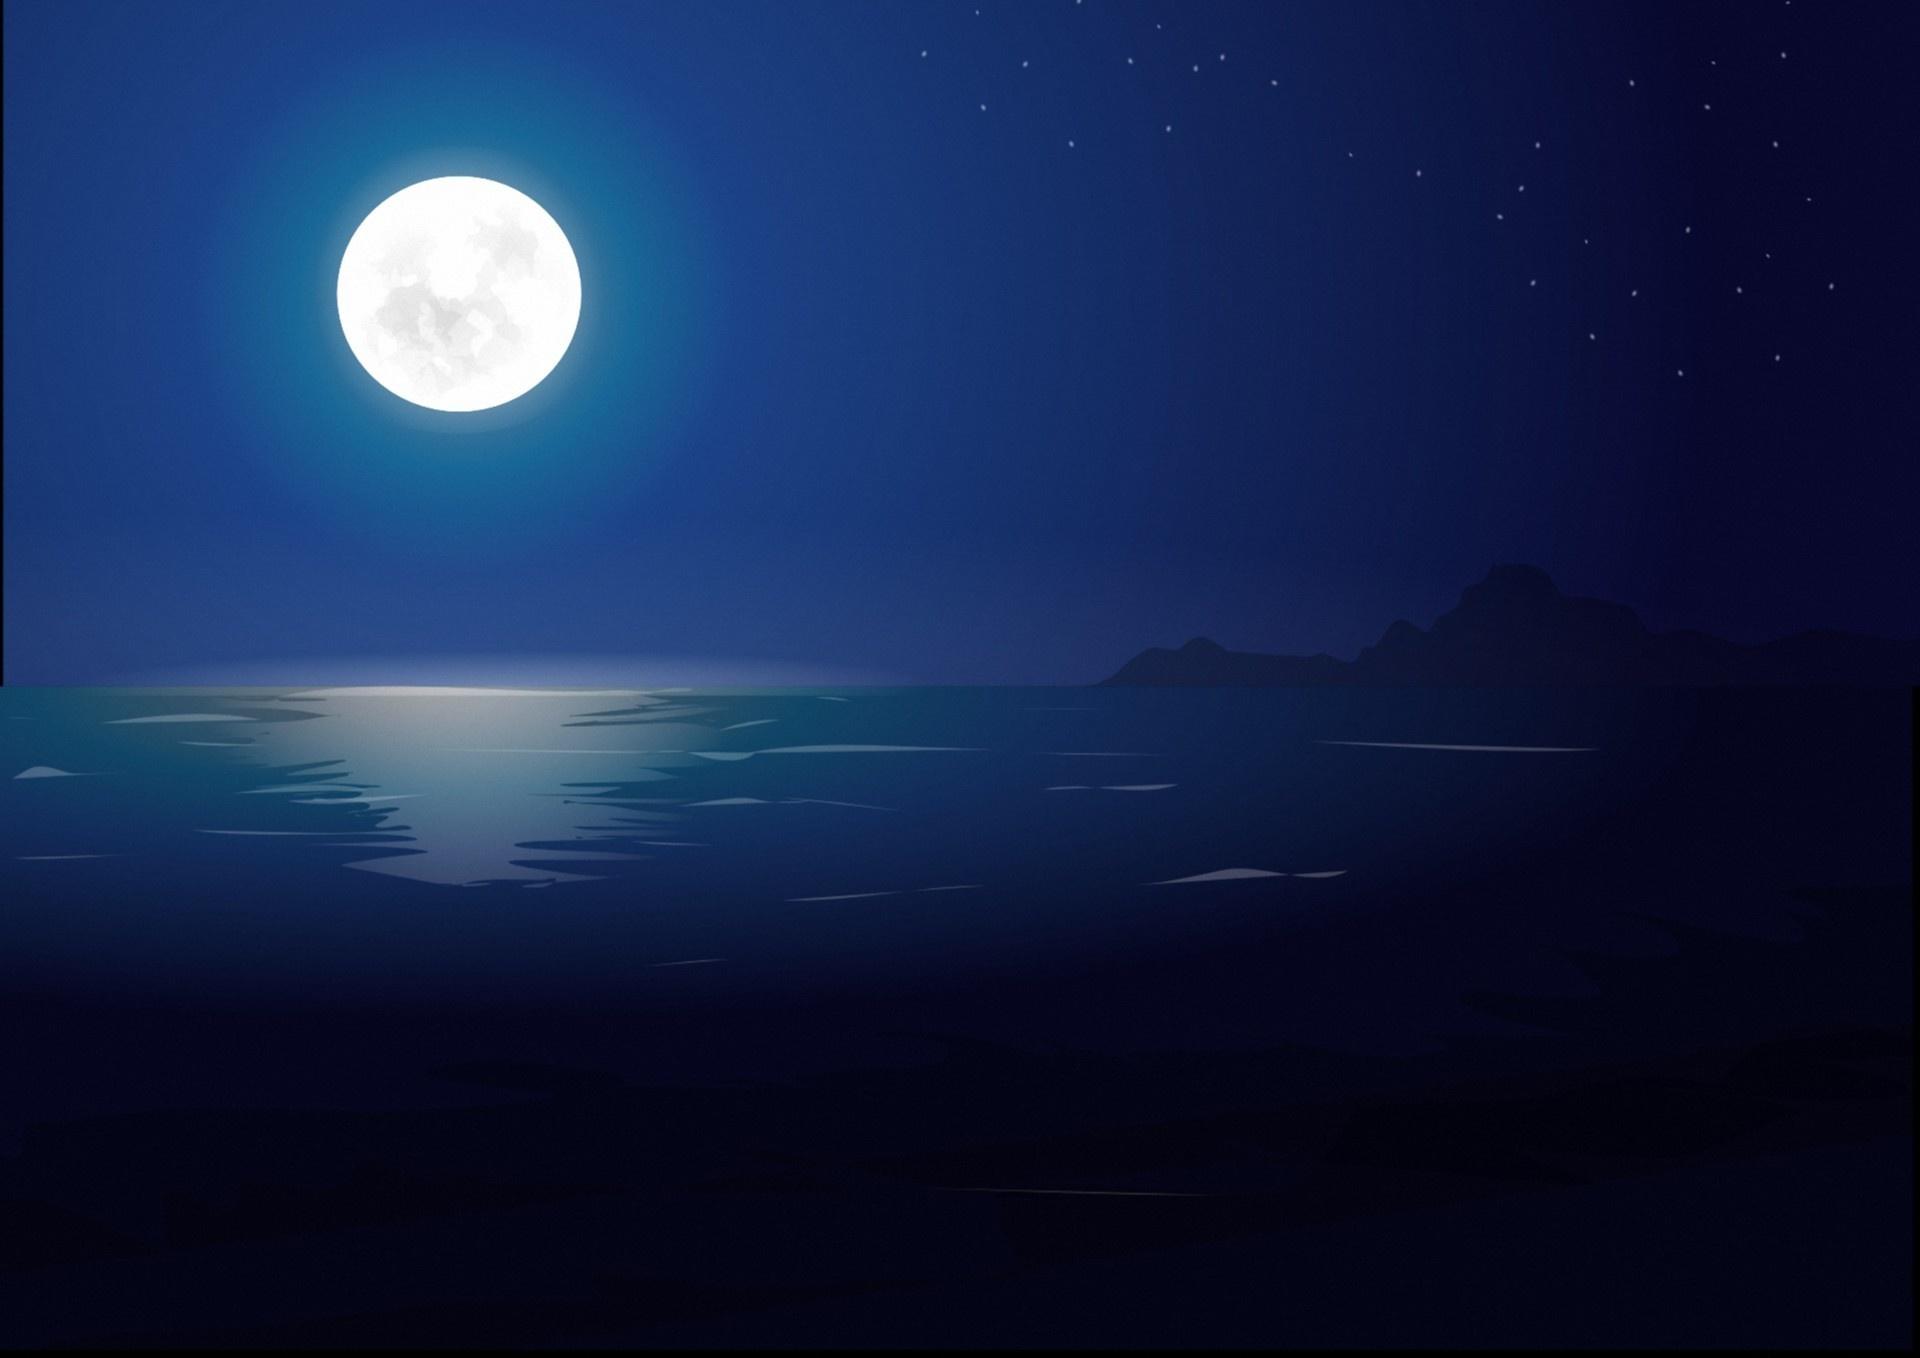 sea night stars landscape art moon wallpaper 1920x1358